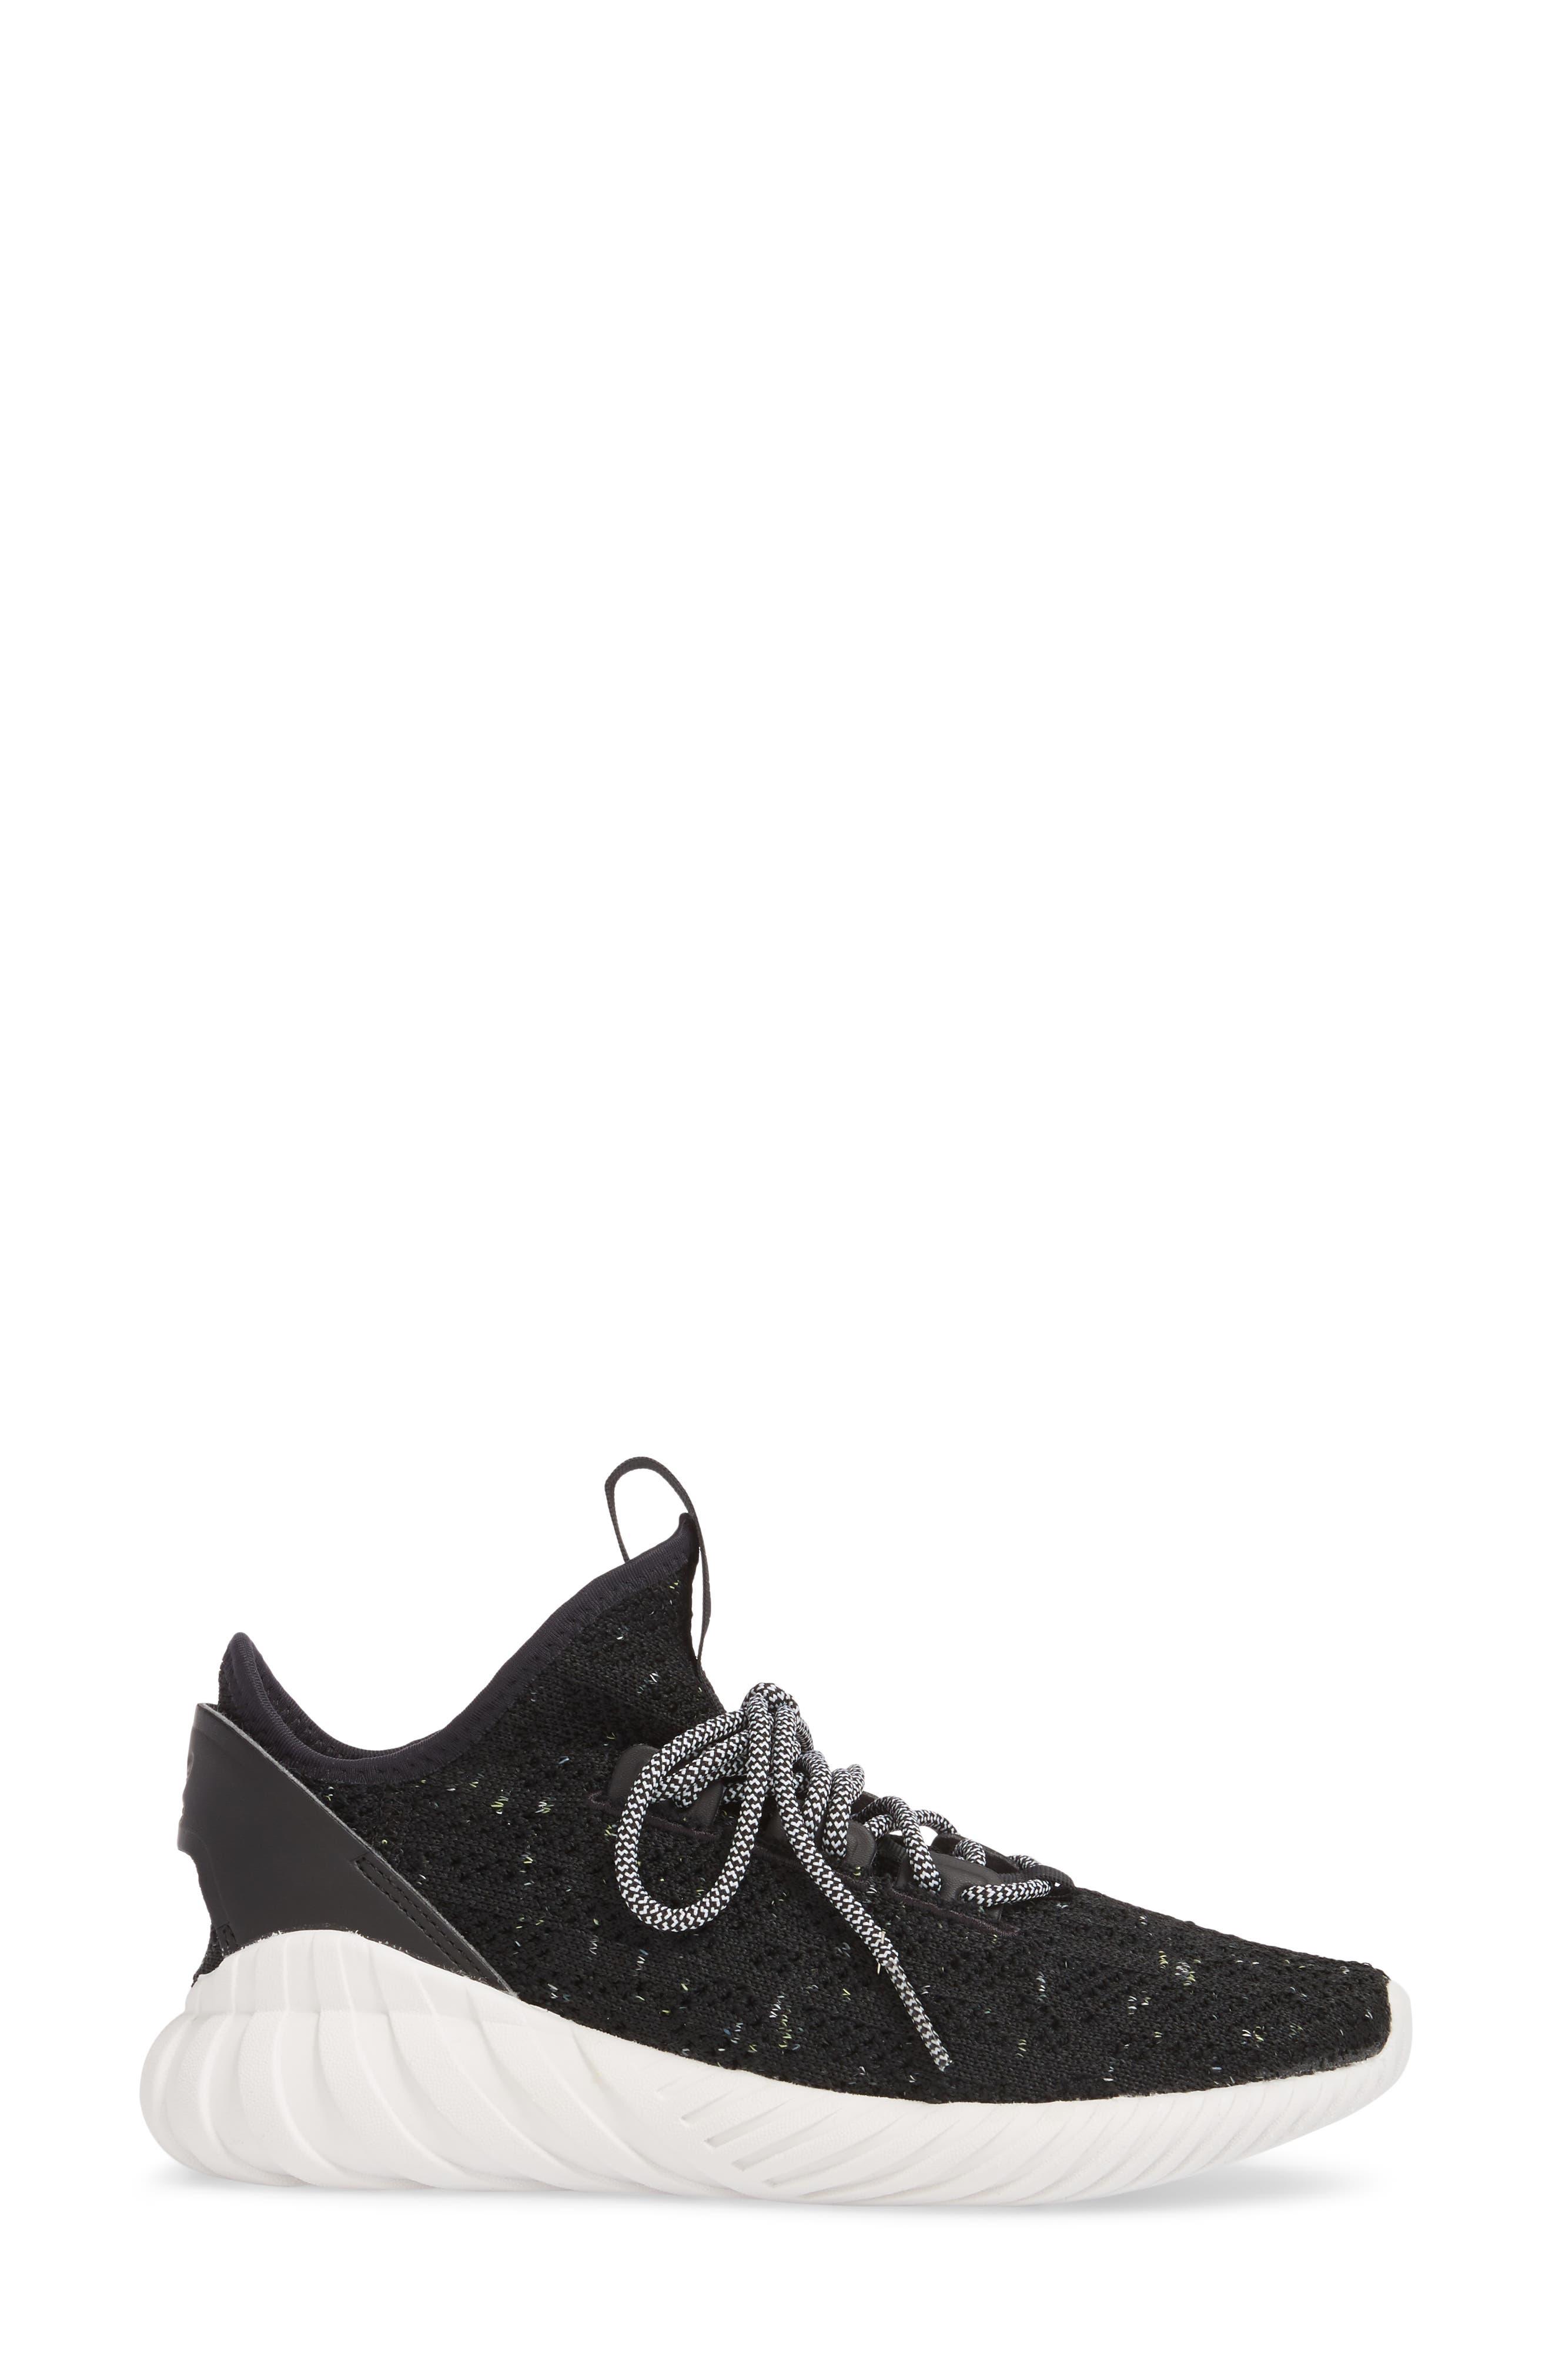 Alternate Image 3  - adidas Tubular Doom Sock Primeknit Sneaker (Women)